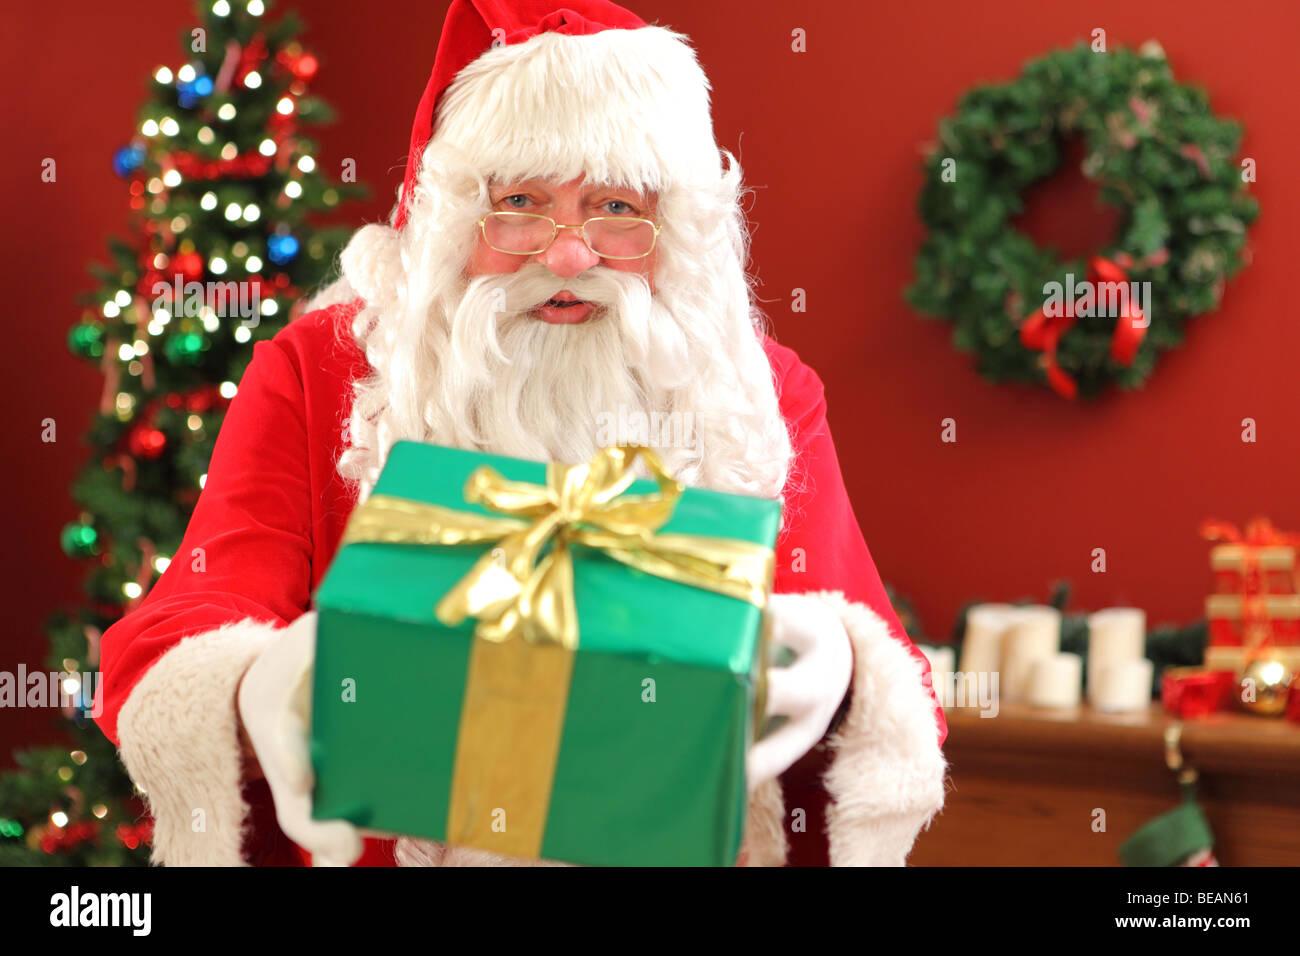 Santa Claus giving gift - Stock Image